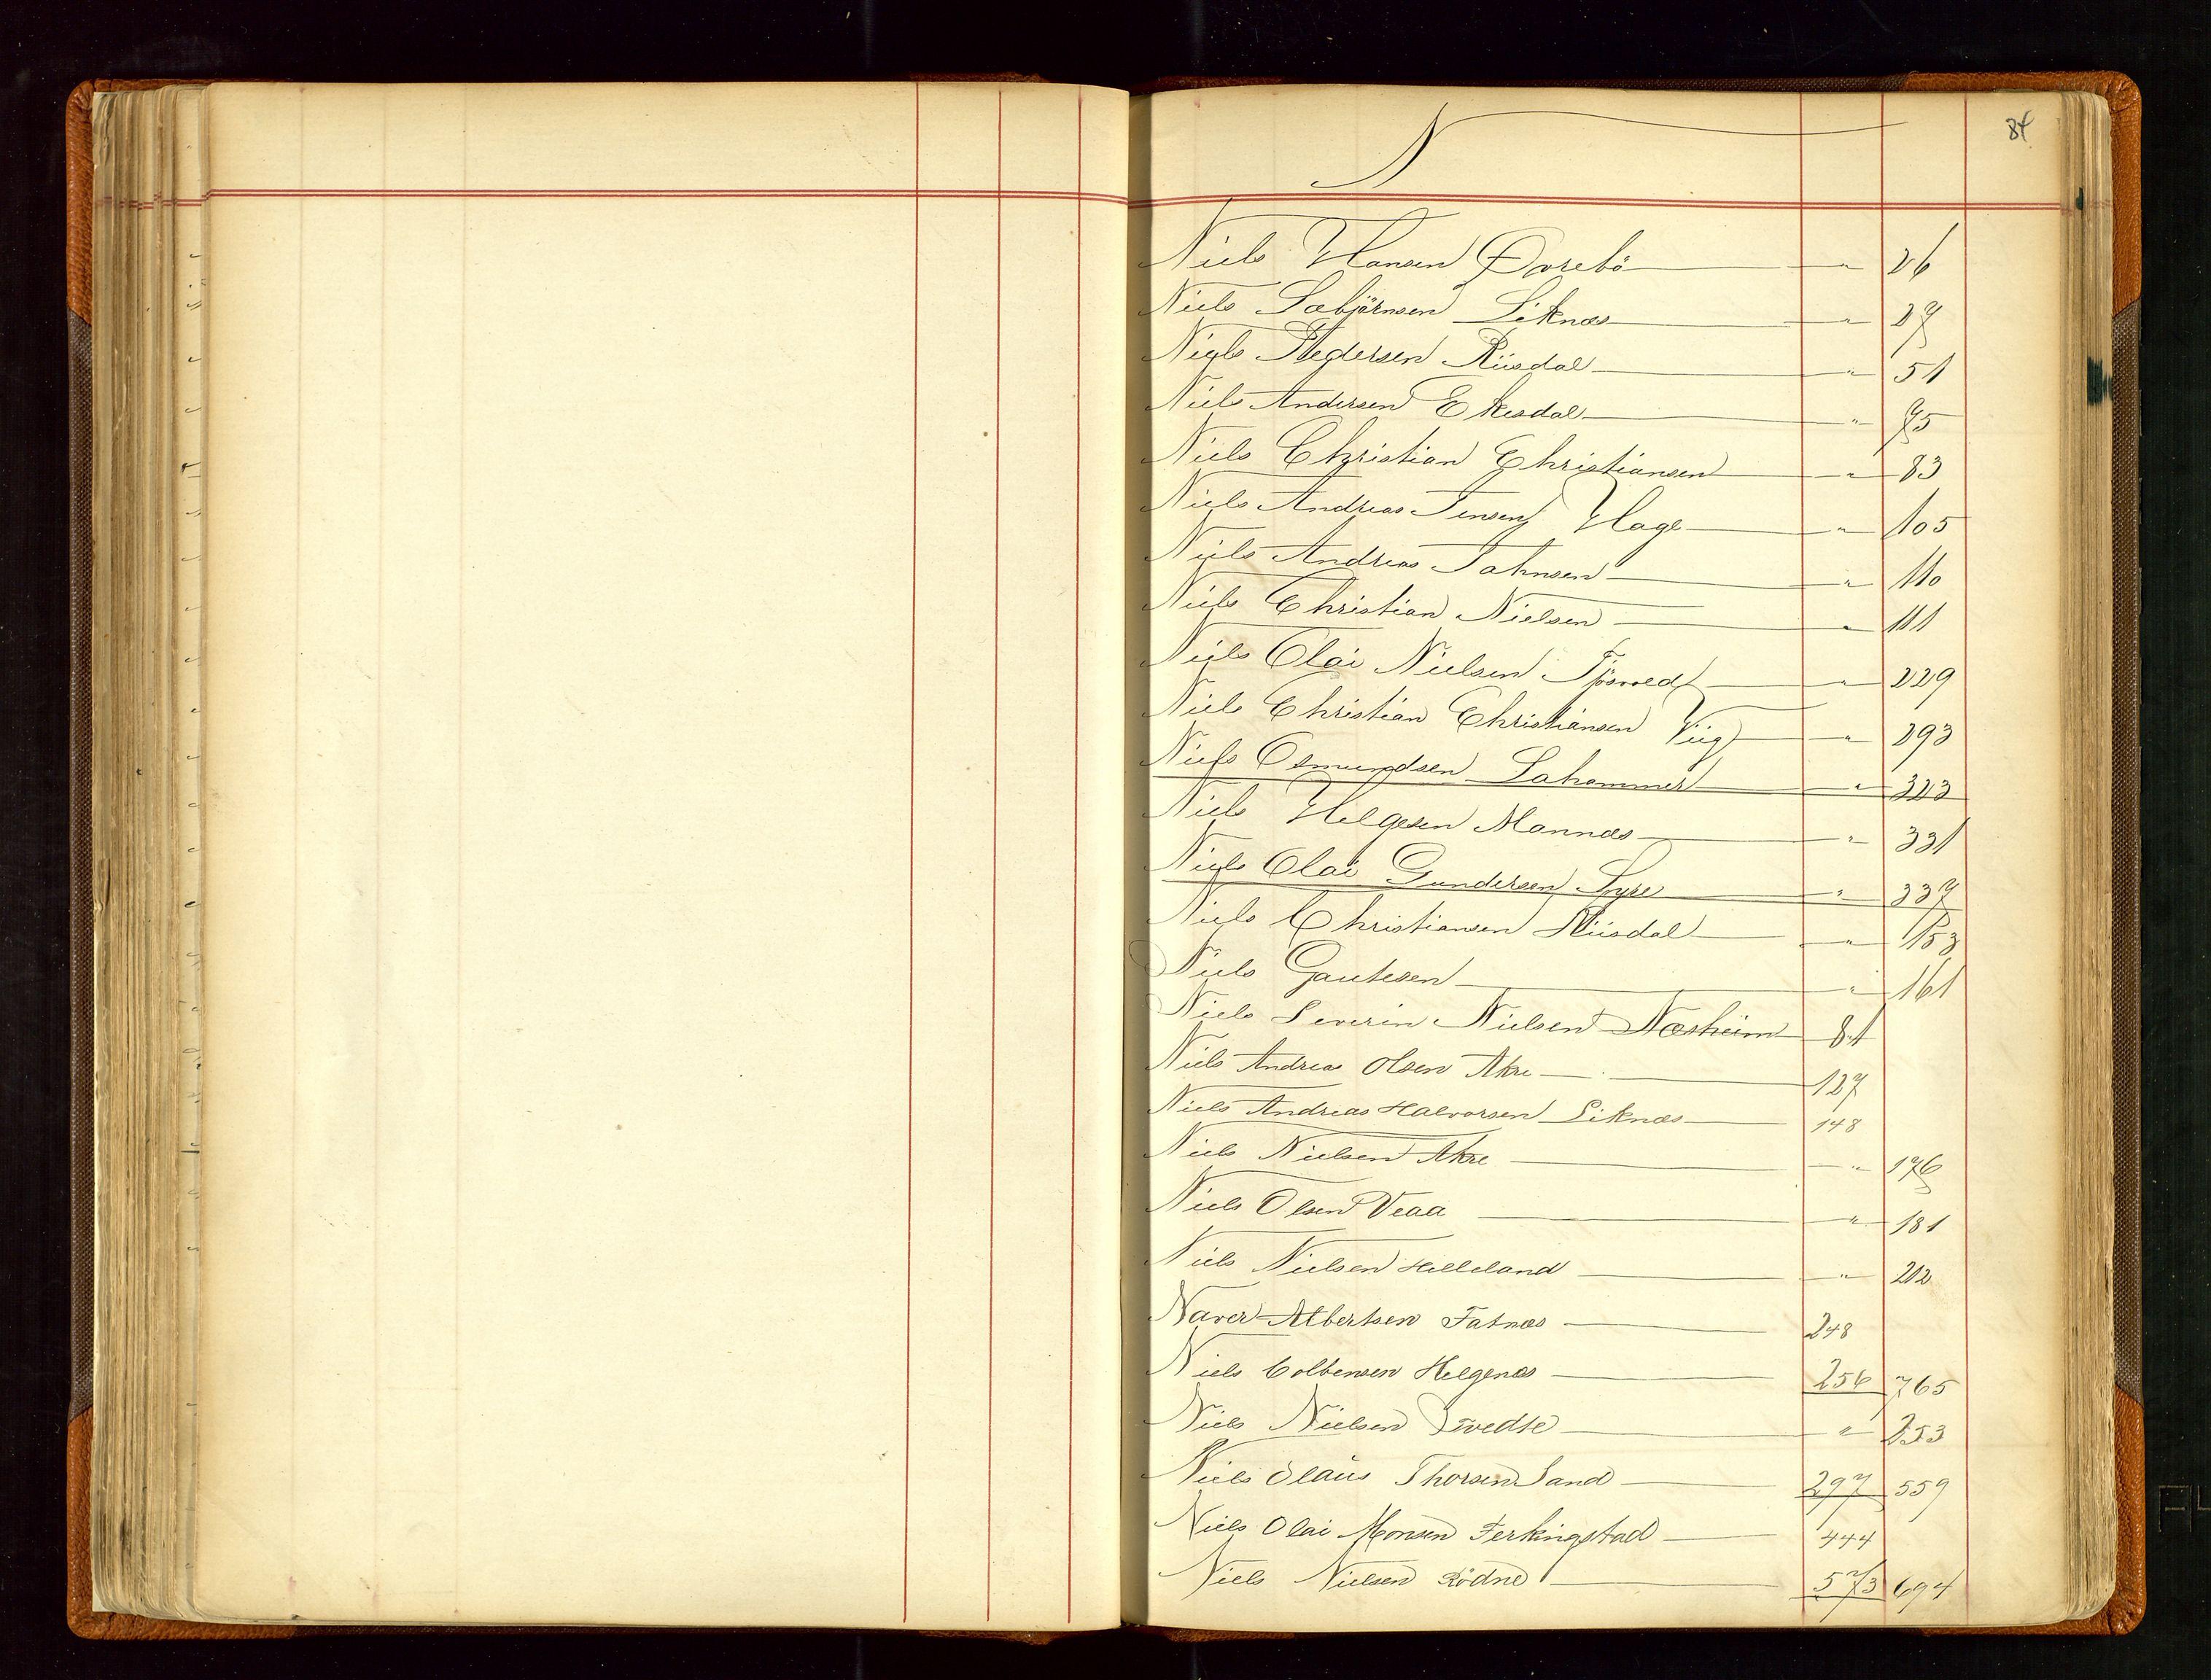 SAST, Haugesund sjømannskontor*, s. 84